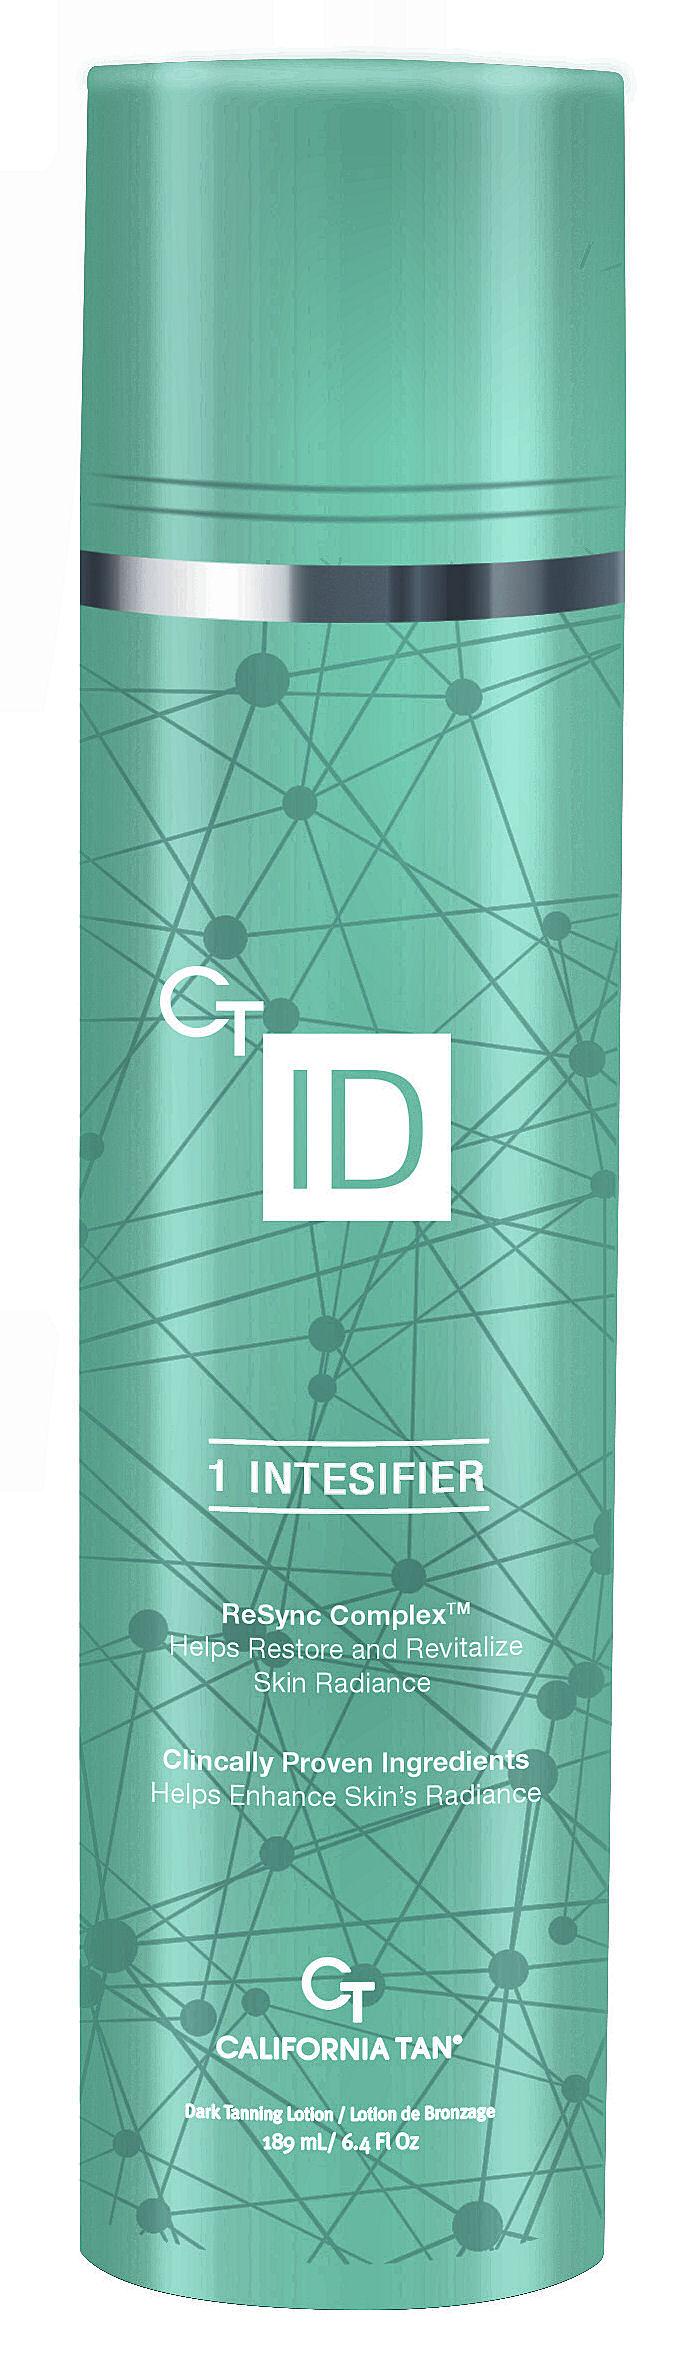 CT ID™ Intensifier ReSync Complex™